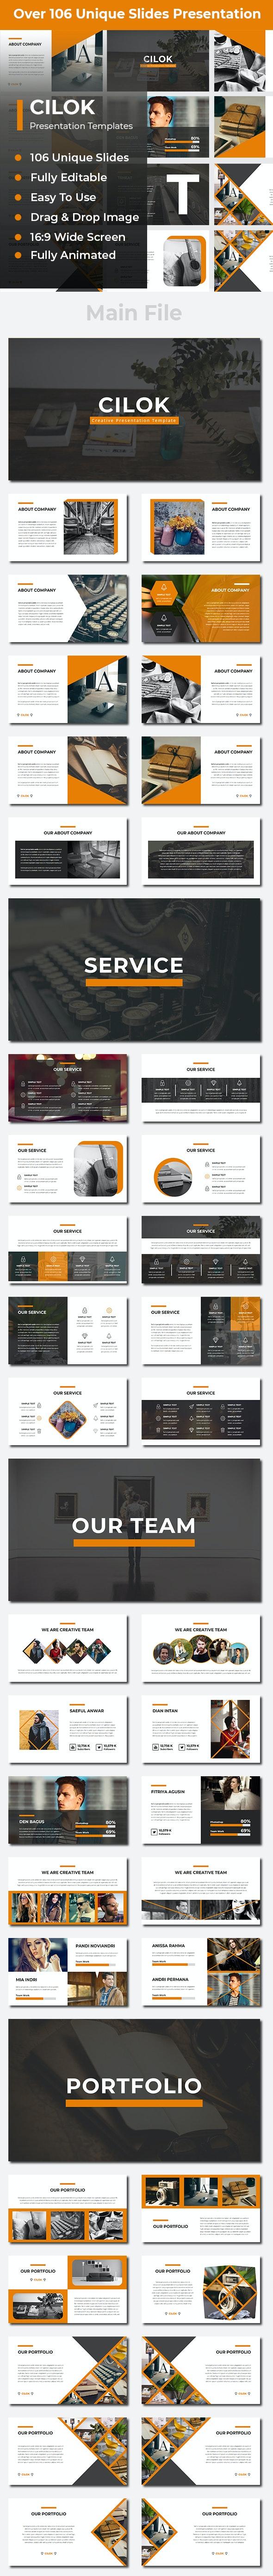 Cilok Creative Powerpoint - Creative PowerPoint Templates